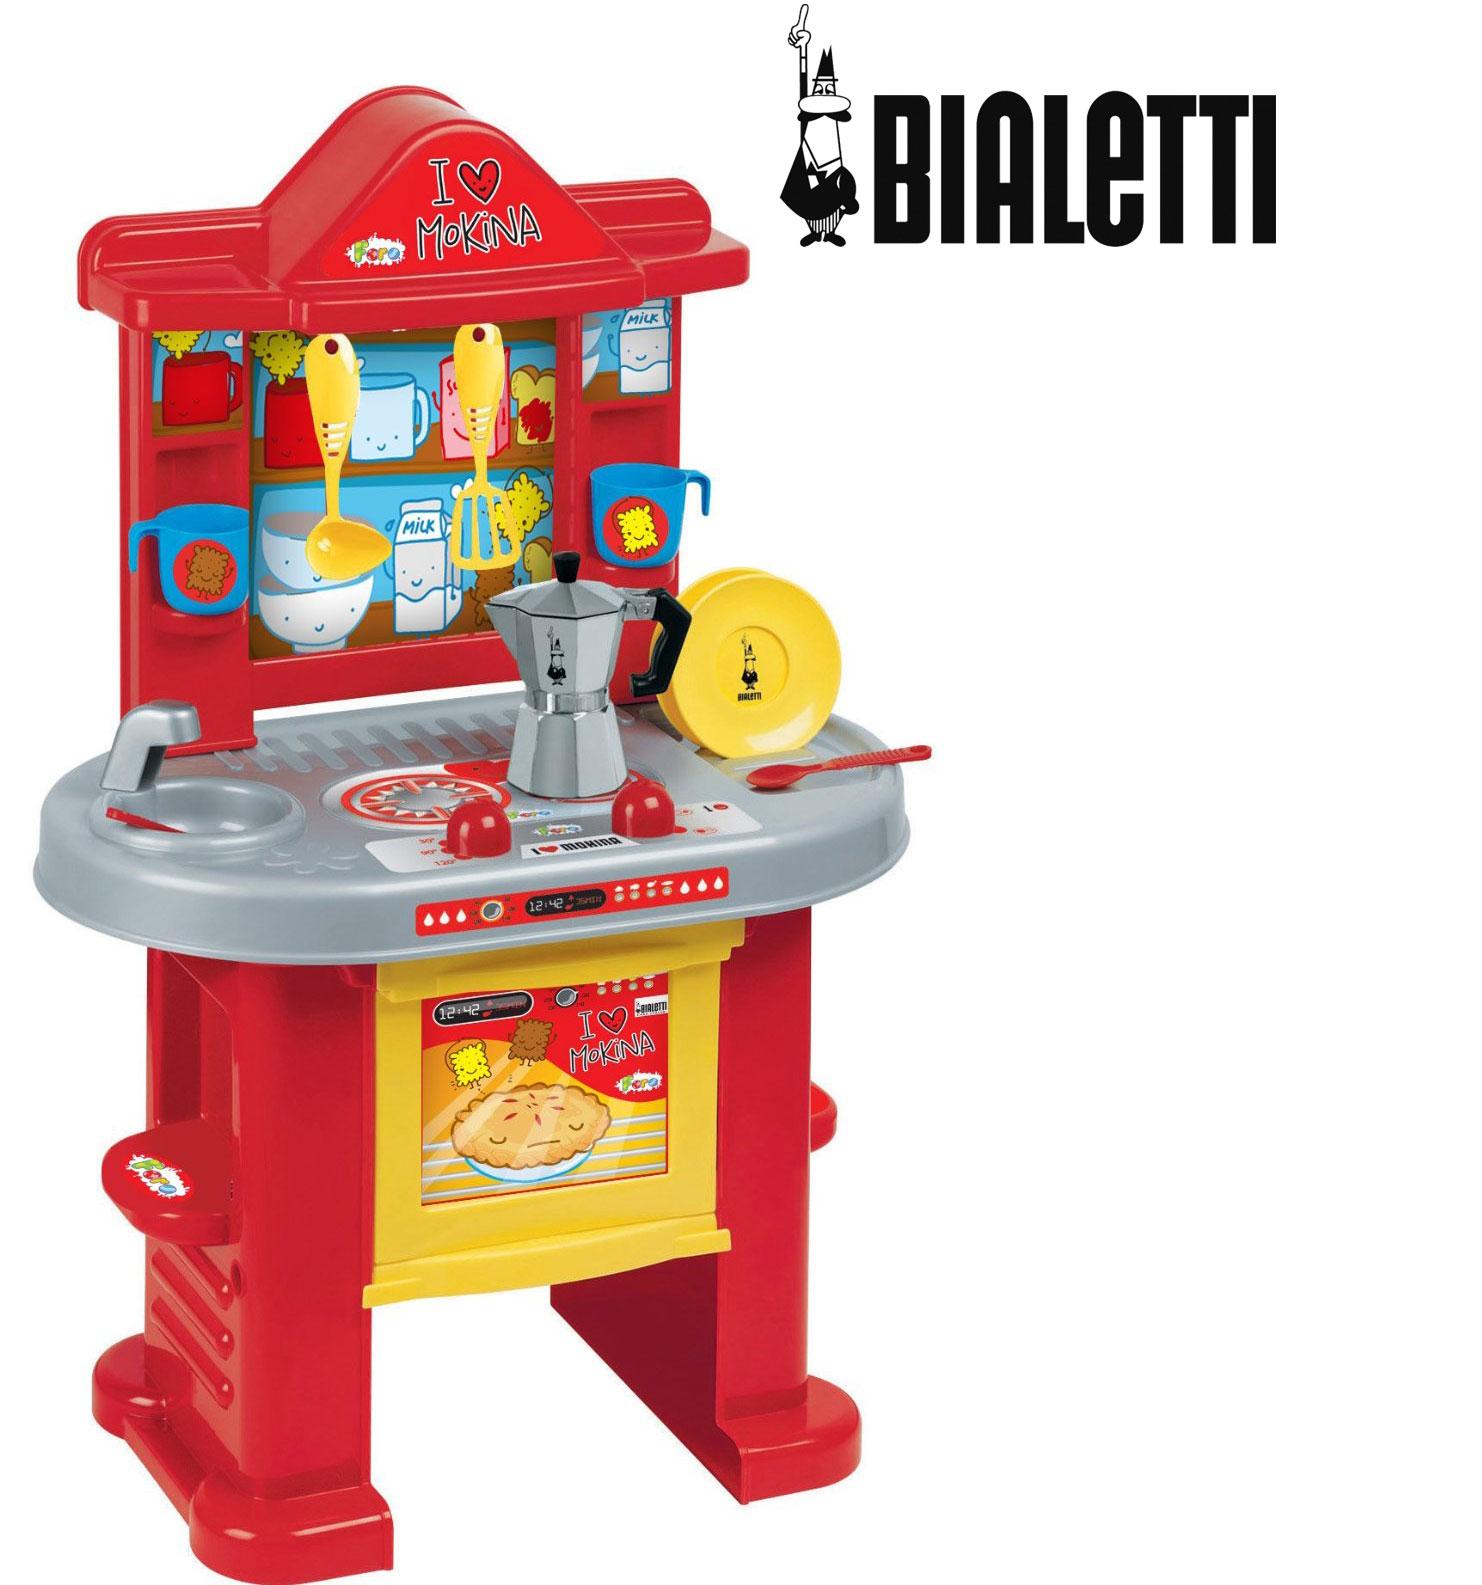 Cucina Bimbi Bimba Con Moka Bialetti Faro 1535 Primavetrina Multimedia Center S R L